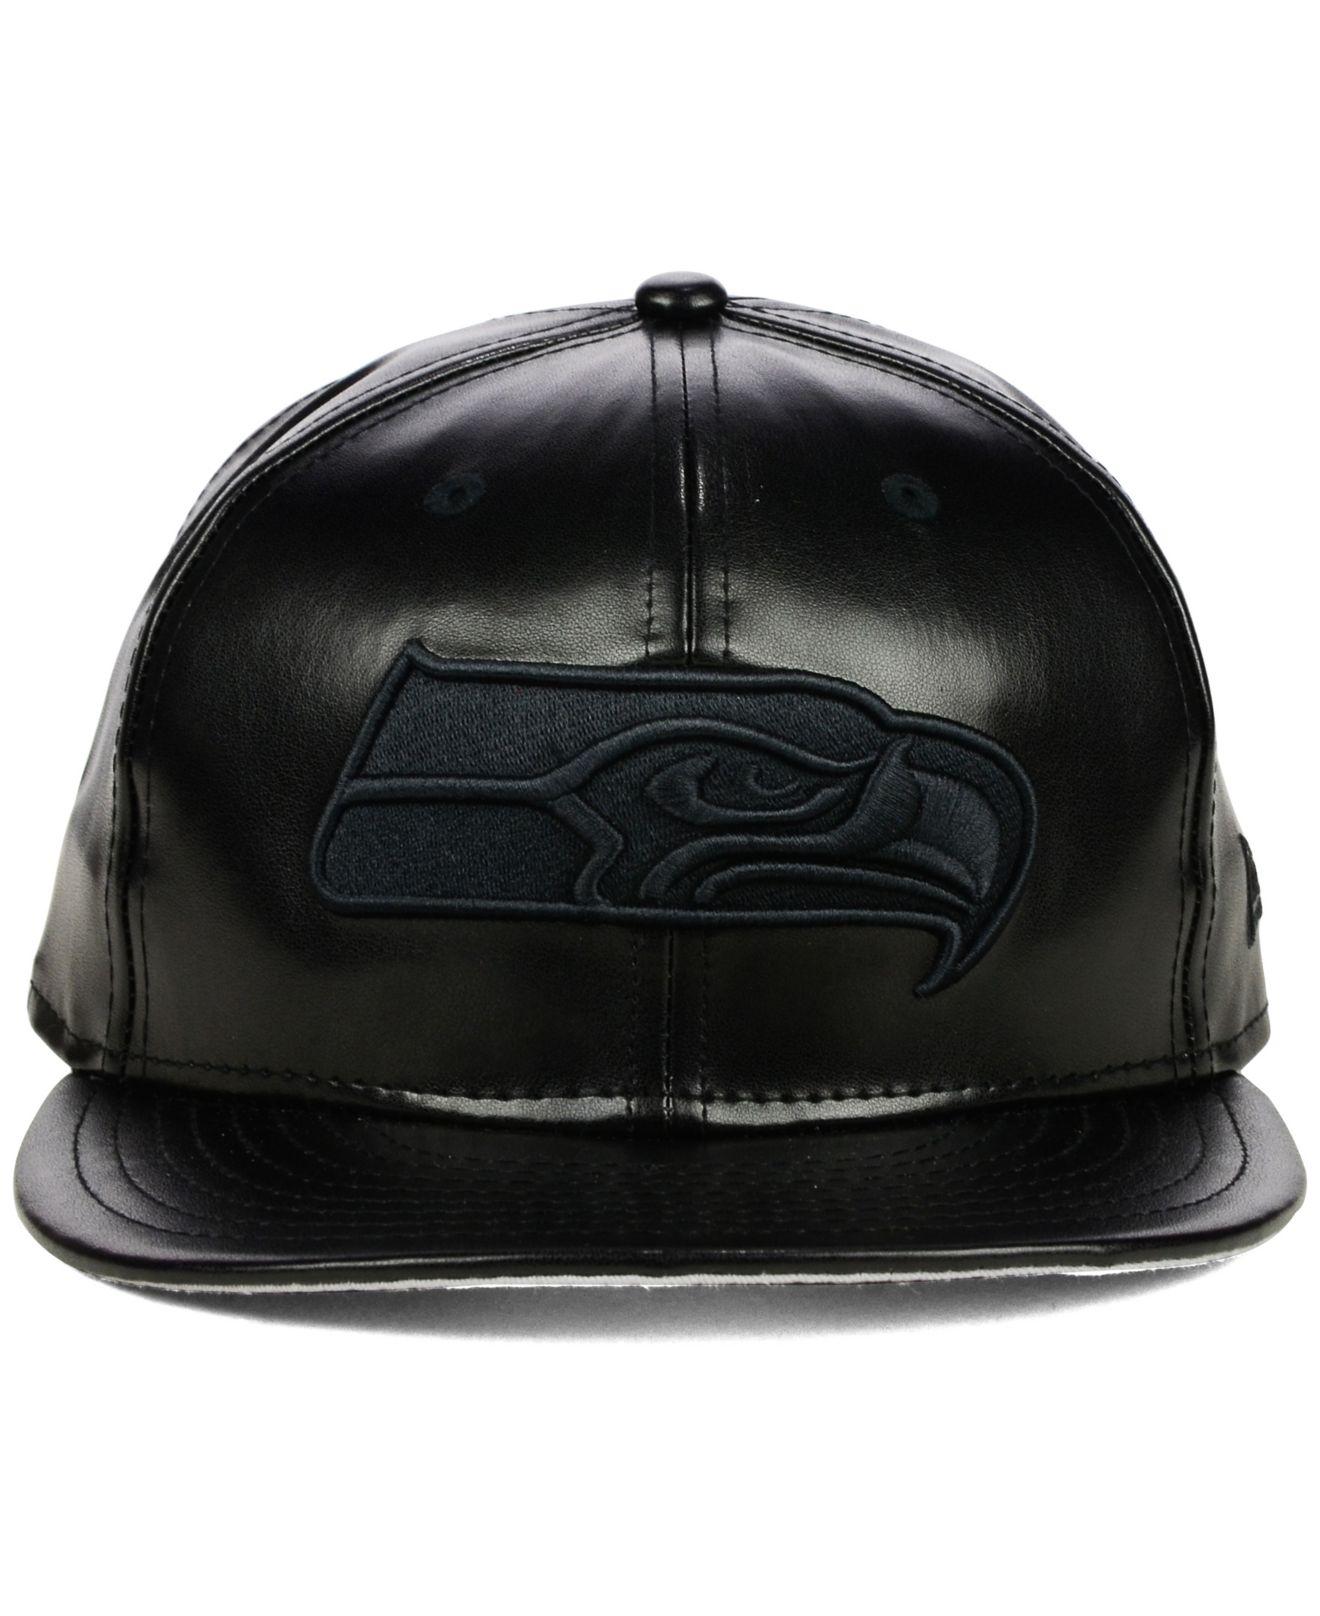 Lyst - KTZ Seattle Seahawks Faux-Leather Black On Black 9Fifty ... a8524338570